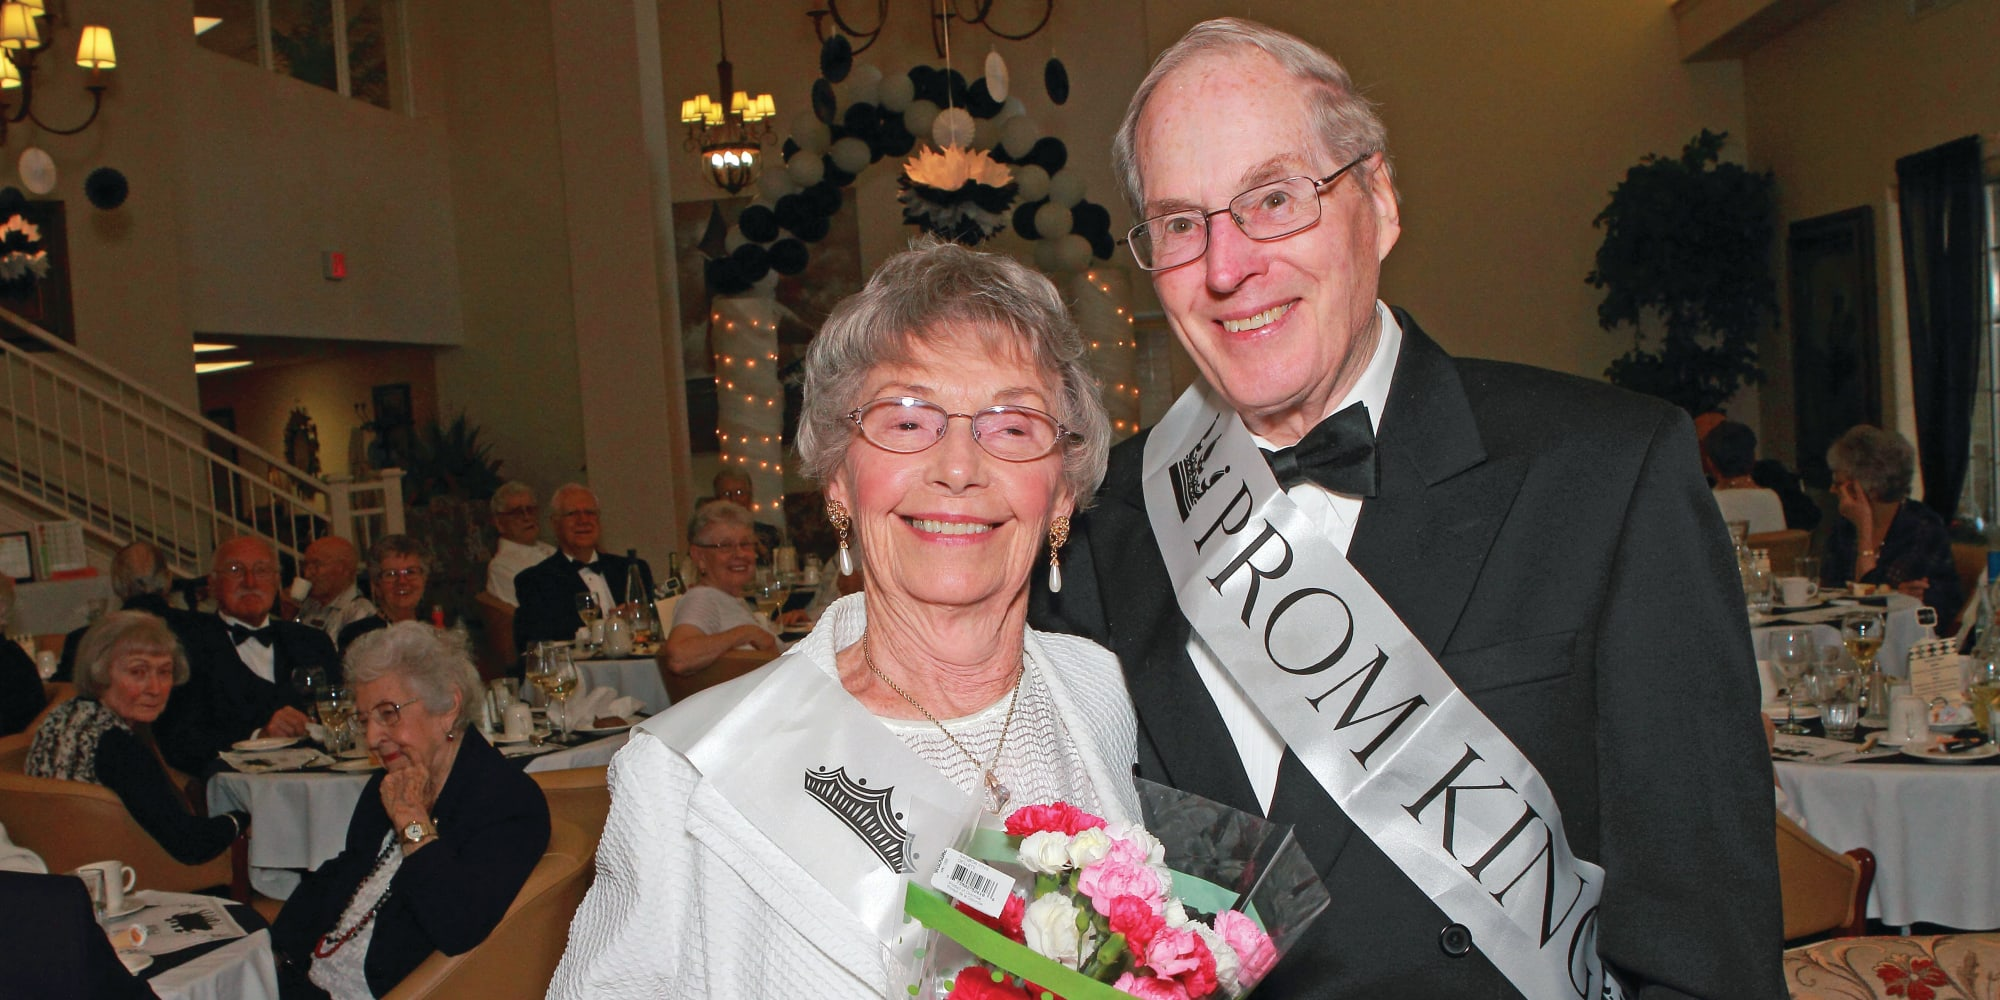 Residents enjoying prom night at Ivy Creek Gracious Retirement Living in Glen Mills, Pennsylvania